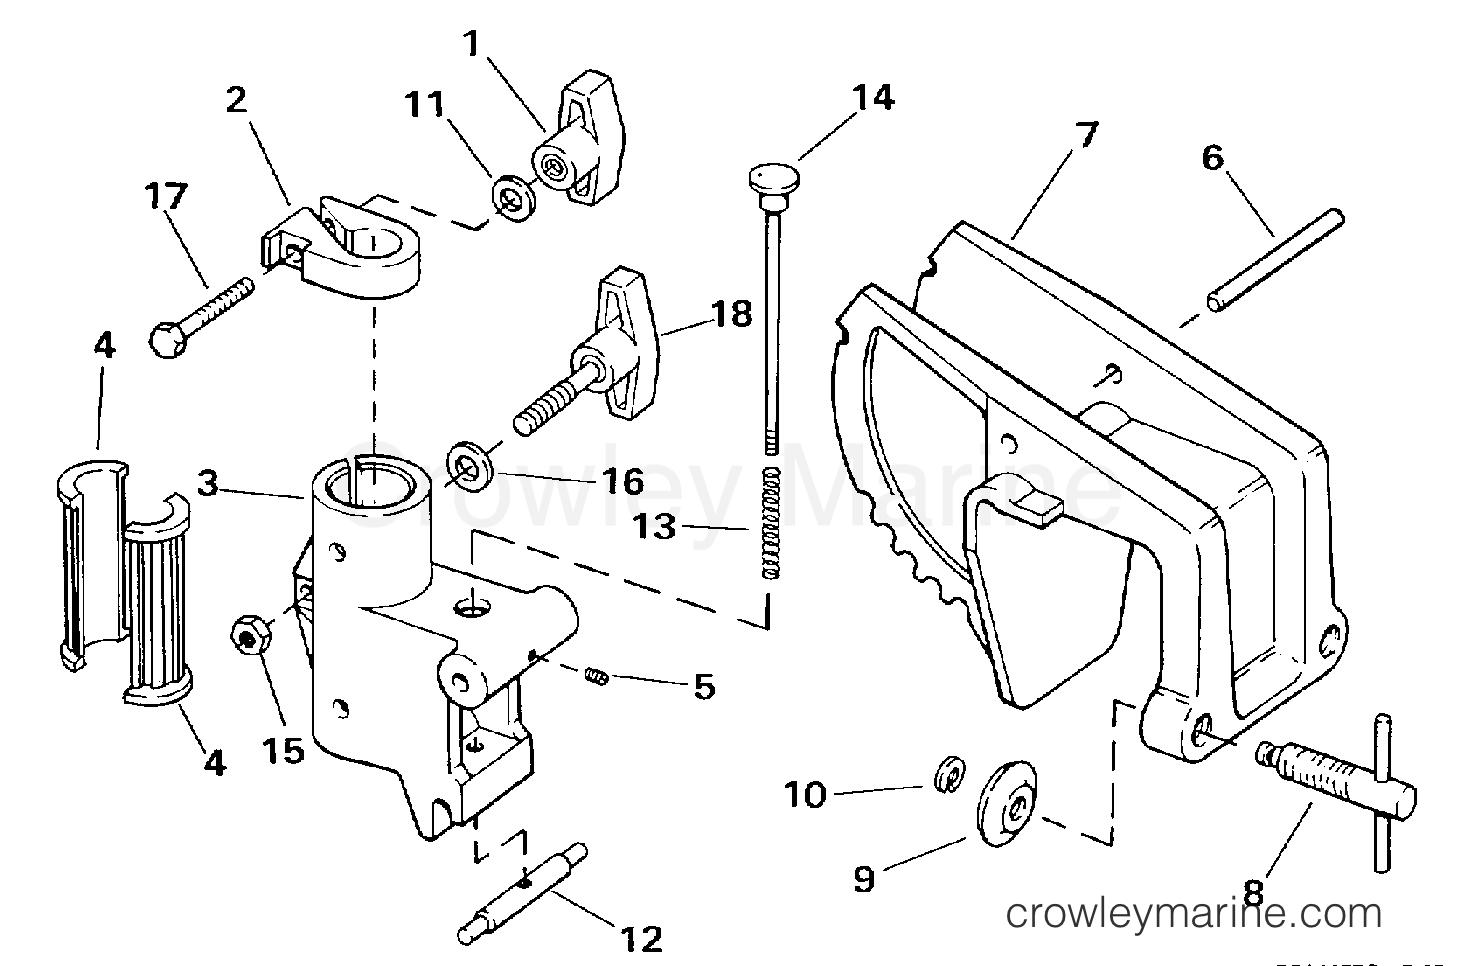 1997 Electric Motors 24 Volt - BFX4TPV - TRANSOM MOUNT STERN BRACKET